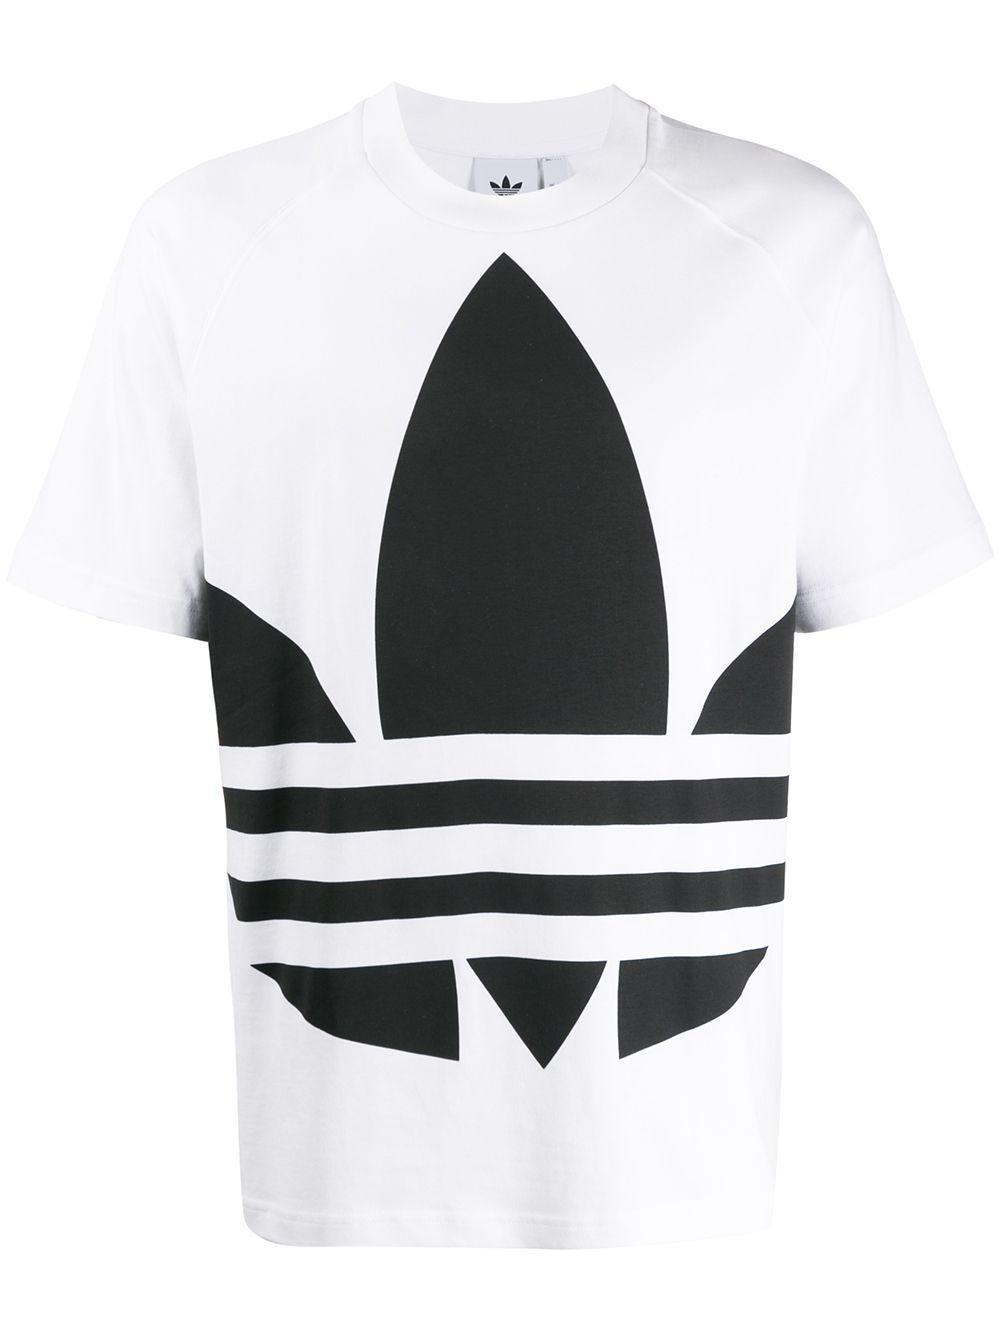 Adidas Logo Print T Shirt In 2020 Adidas Logo T Shirt Adidas